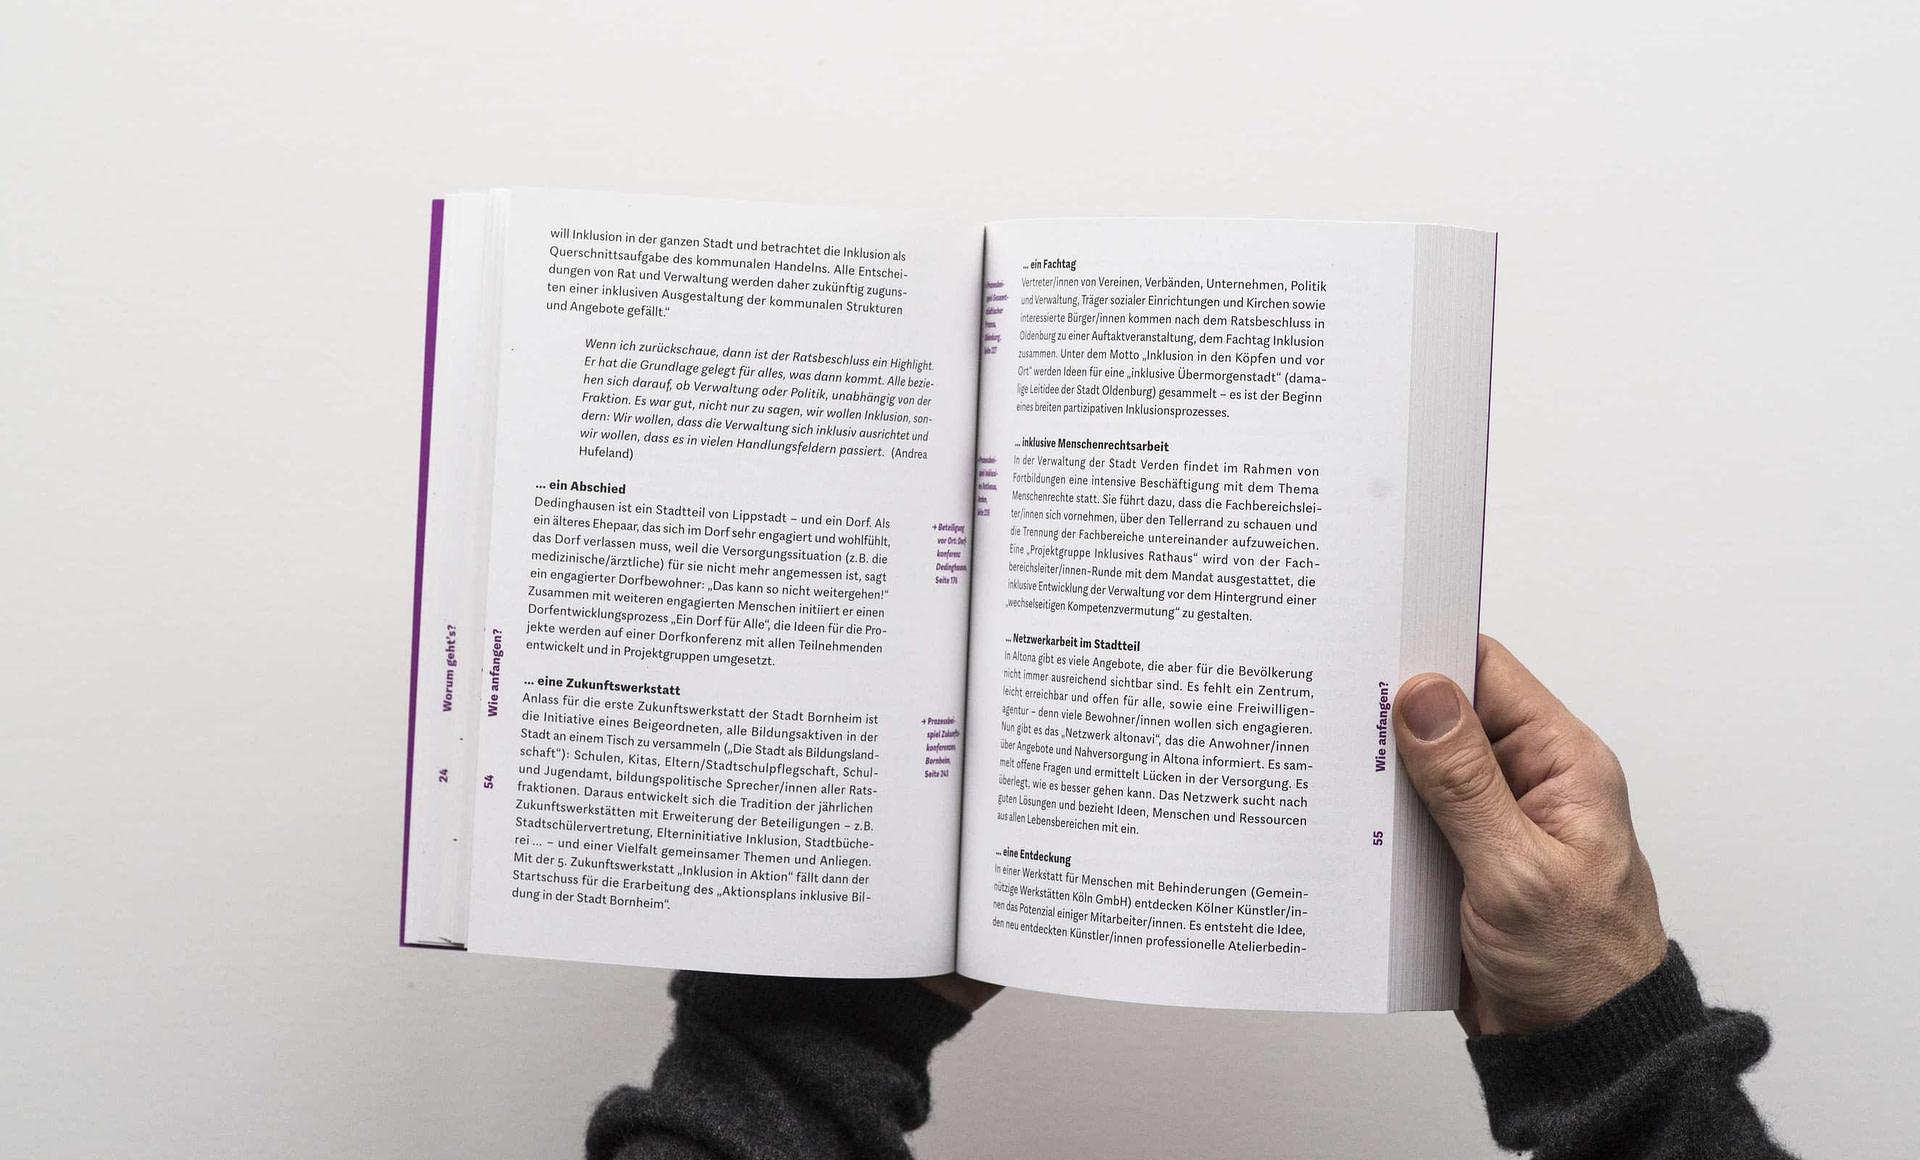 inclusion-fieldbook-13-2650x1600px